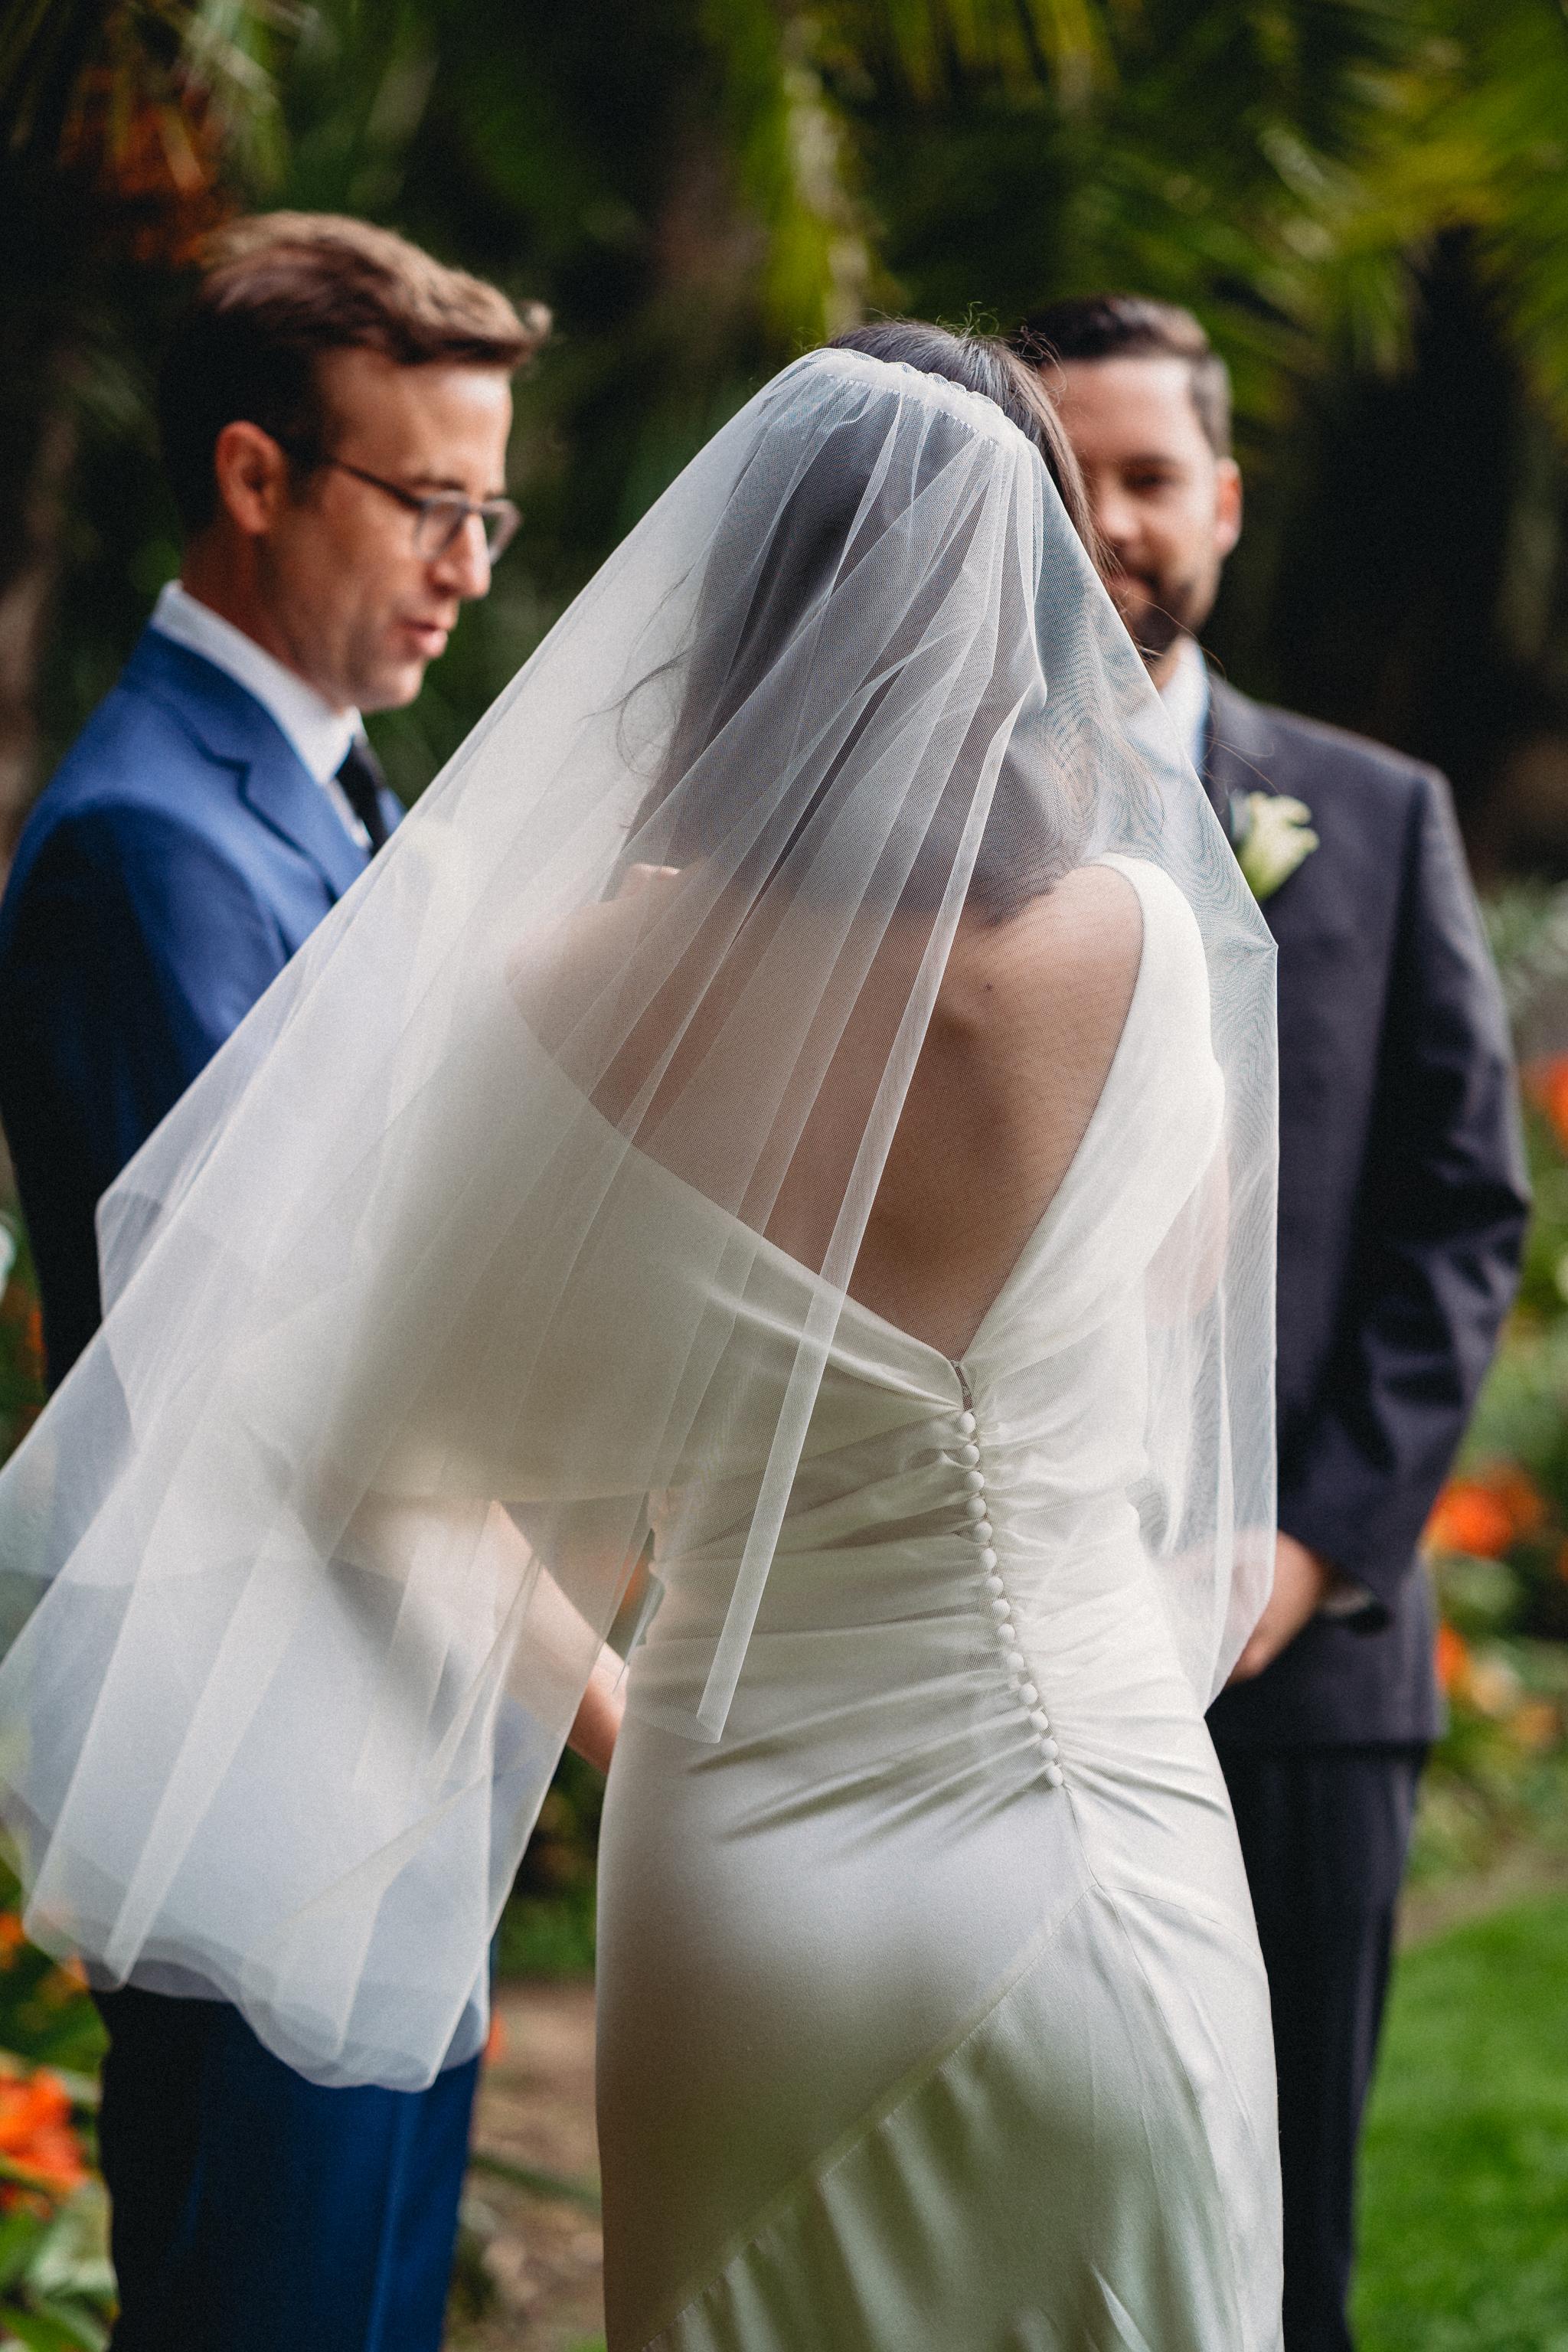 wedding-photography-santa-barbara-courthouse-rebeccaylasotras-58.jpg